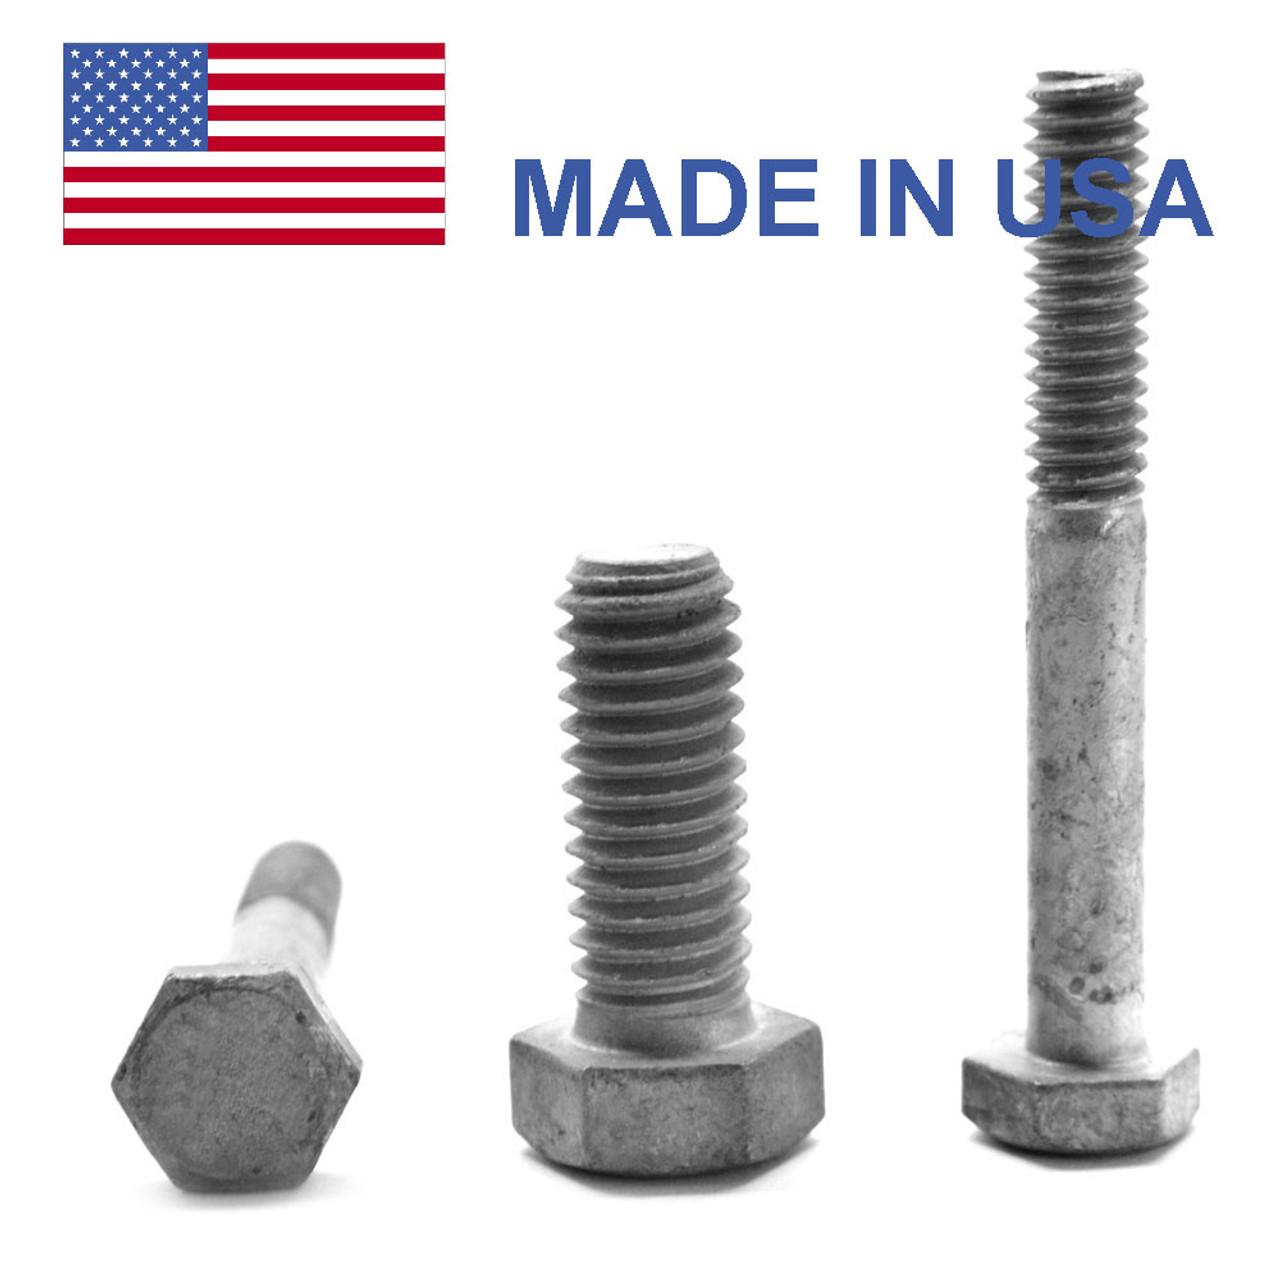 "1 1/4""-7 x 2 1/4"" Coarse Thread Grade A325 Type 1 Heavy Hex Structural Bolt - USA Medium Carbon Steel Hot Dip Galvanized"